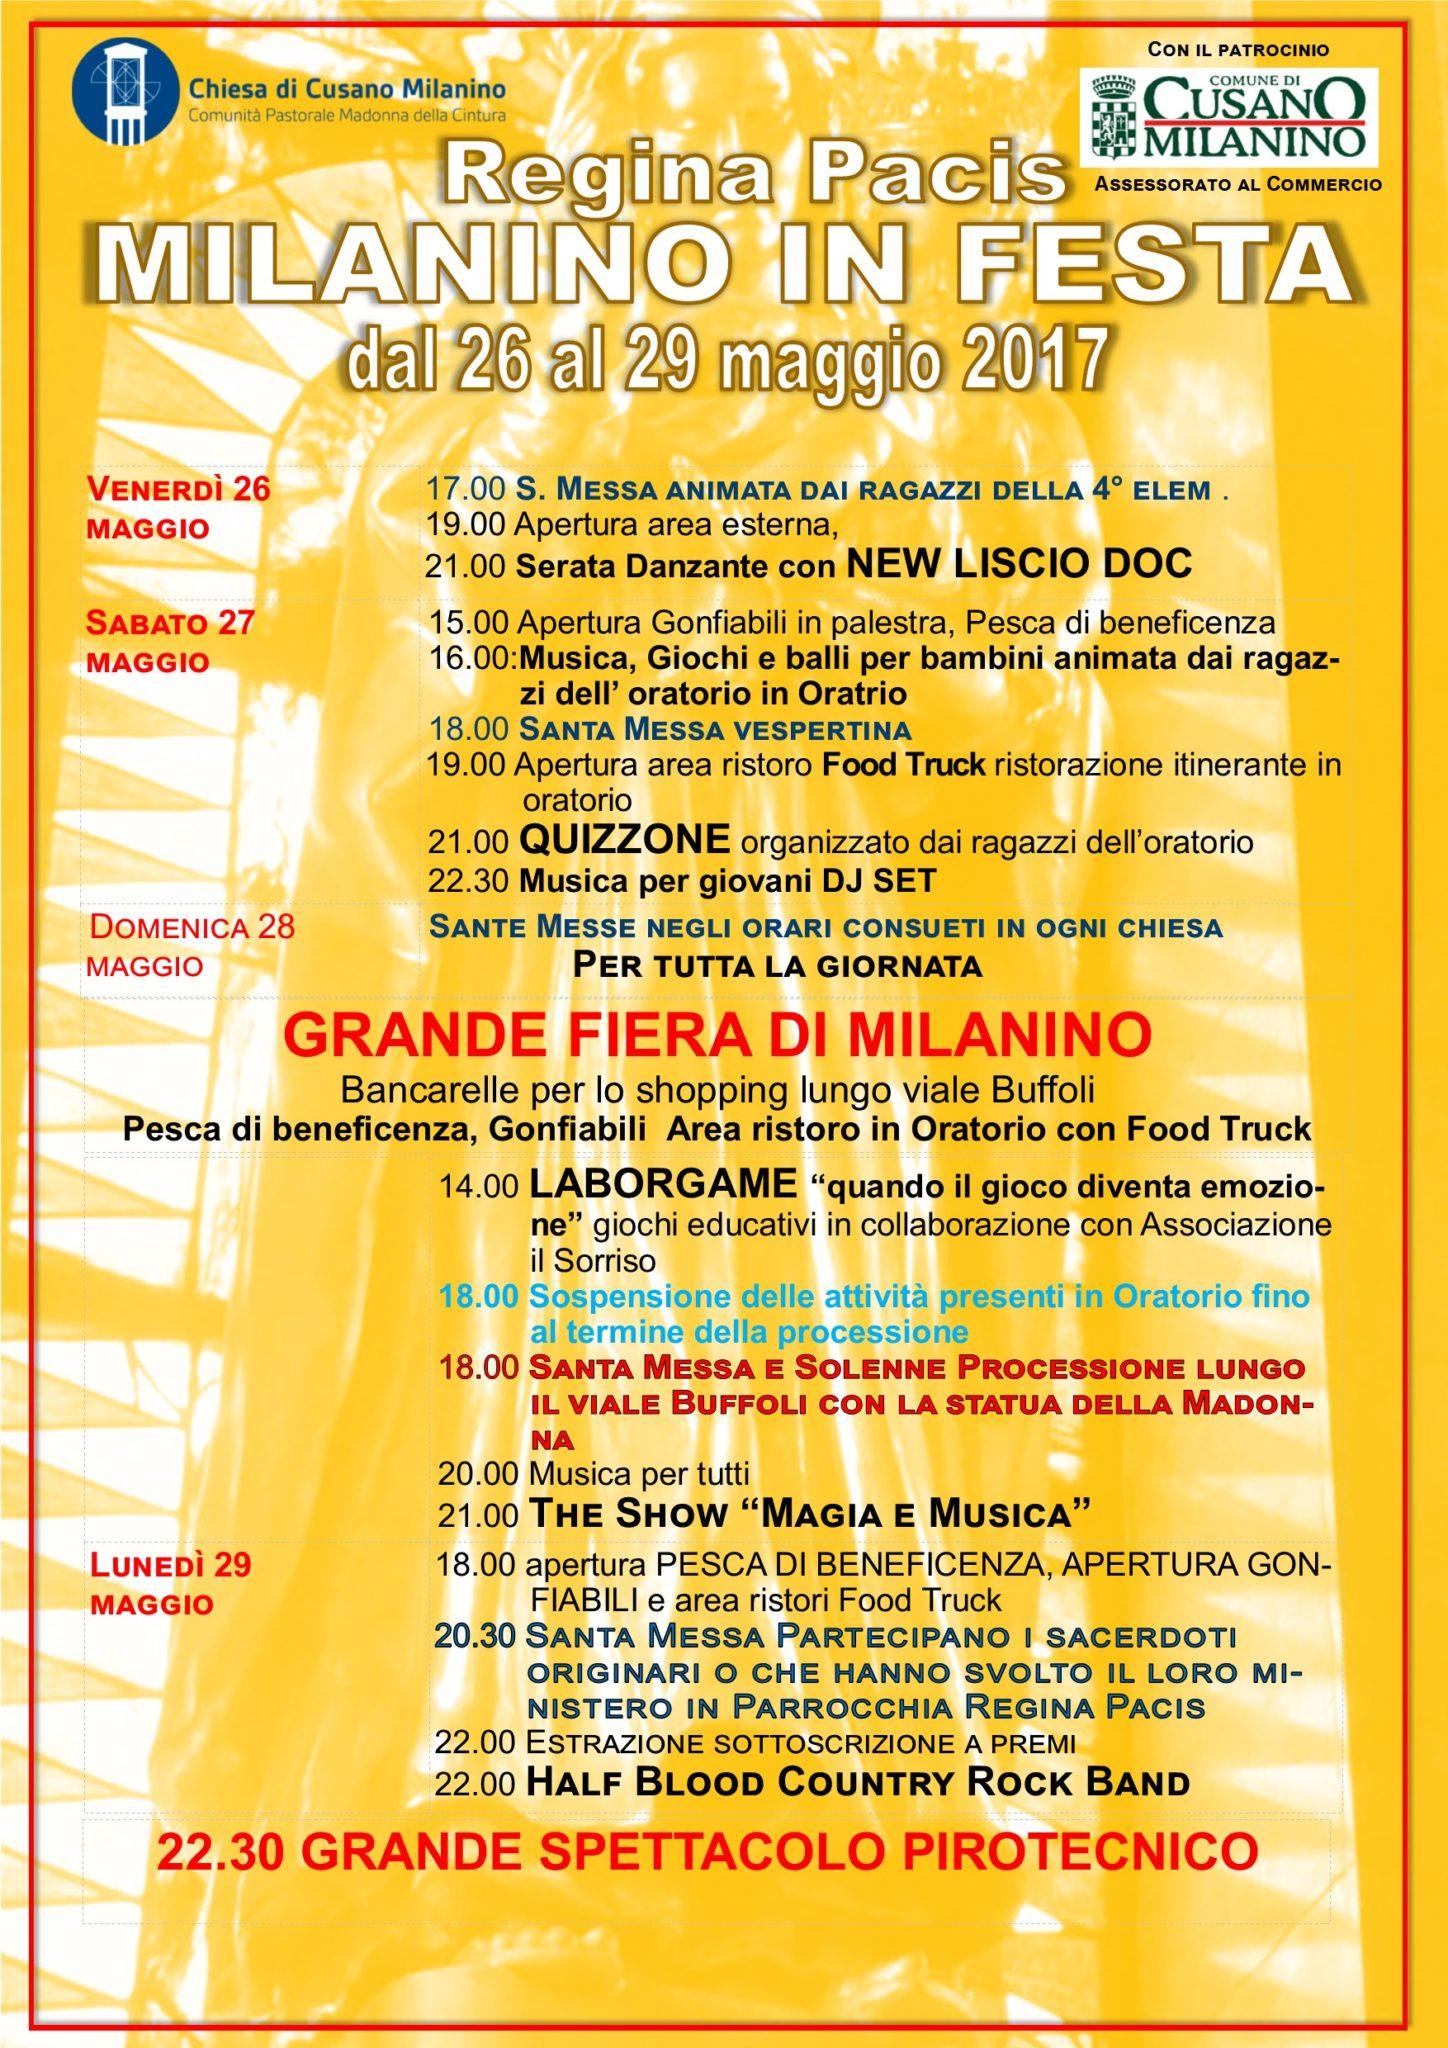 cartellone_festa_milanino_2017_sc.jpg